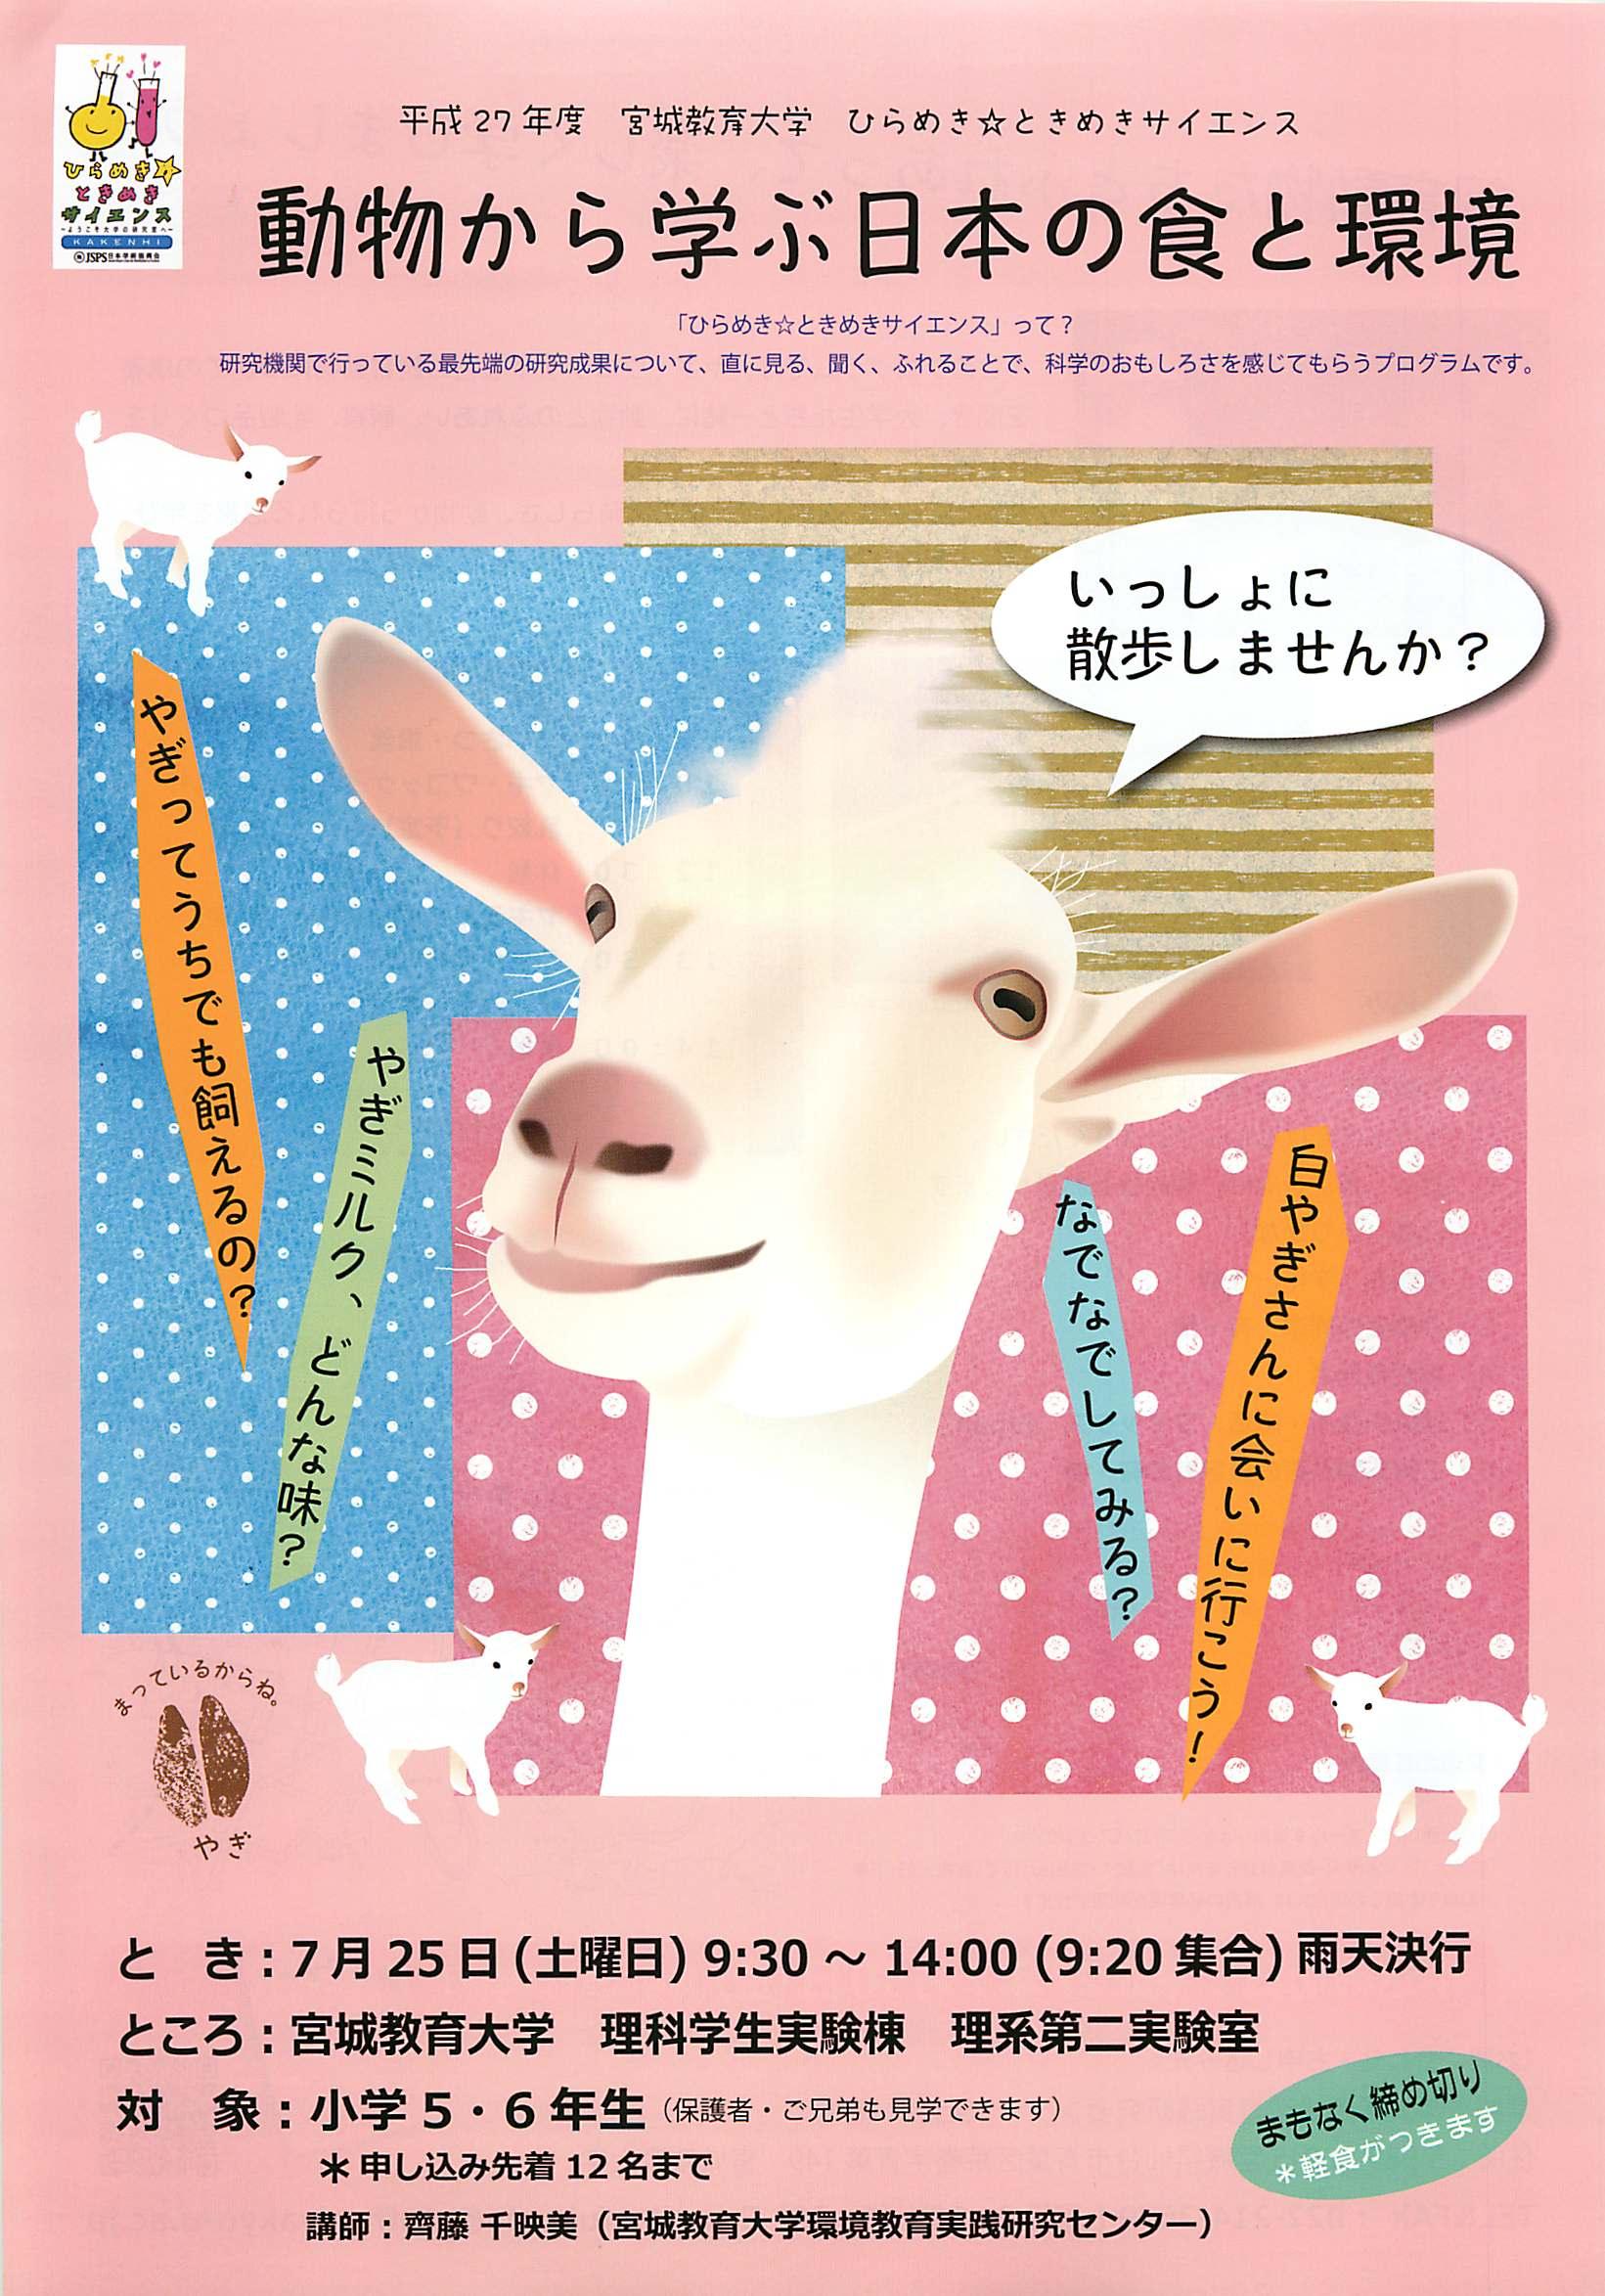 http://www.eec.miyakyo-u.ac.jp/blog/images/hirameki2015_omote.jpg